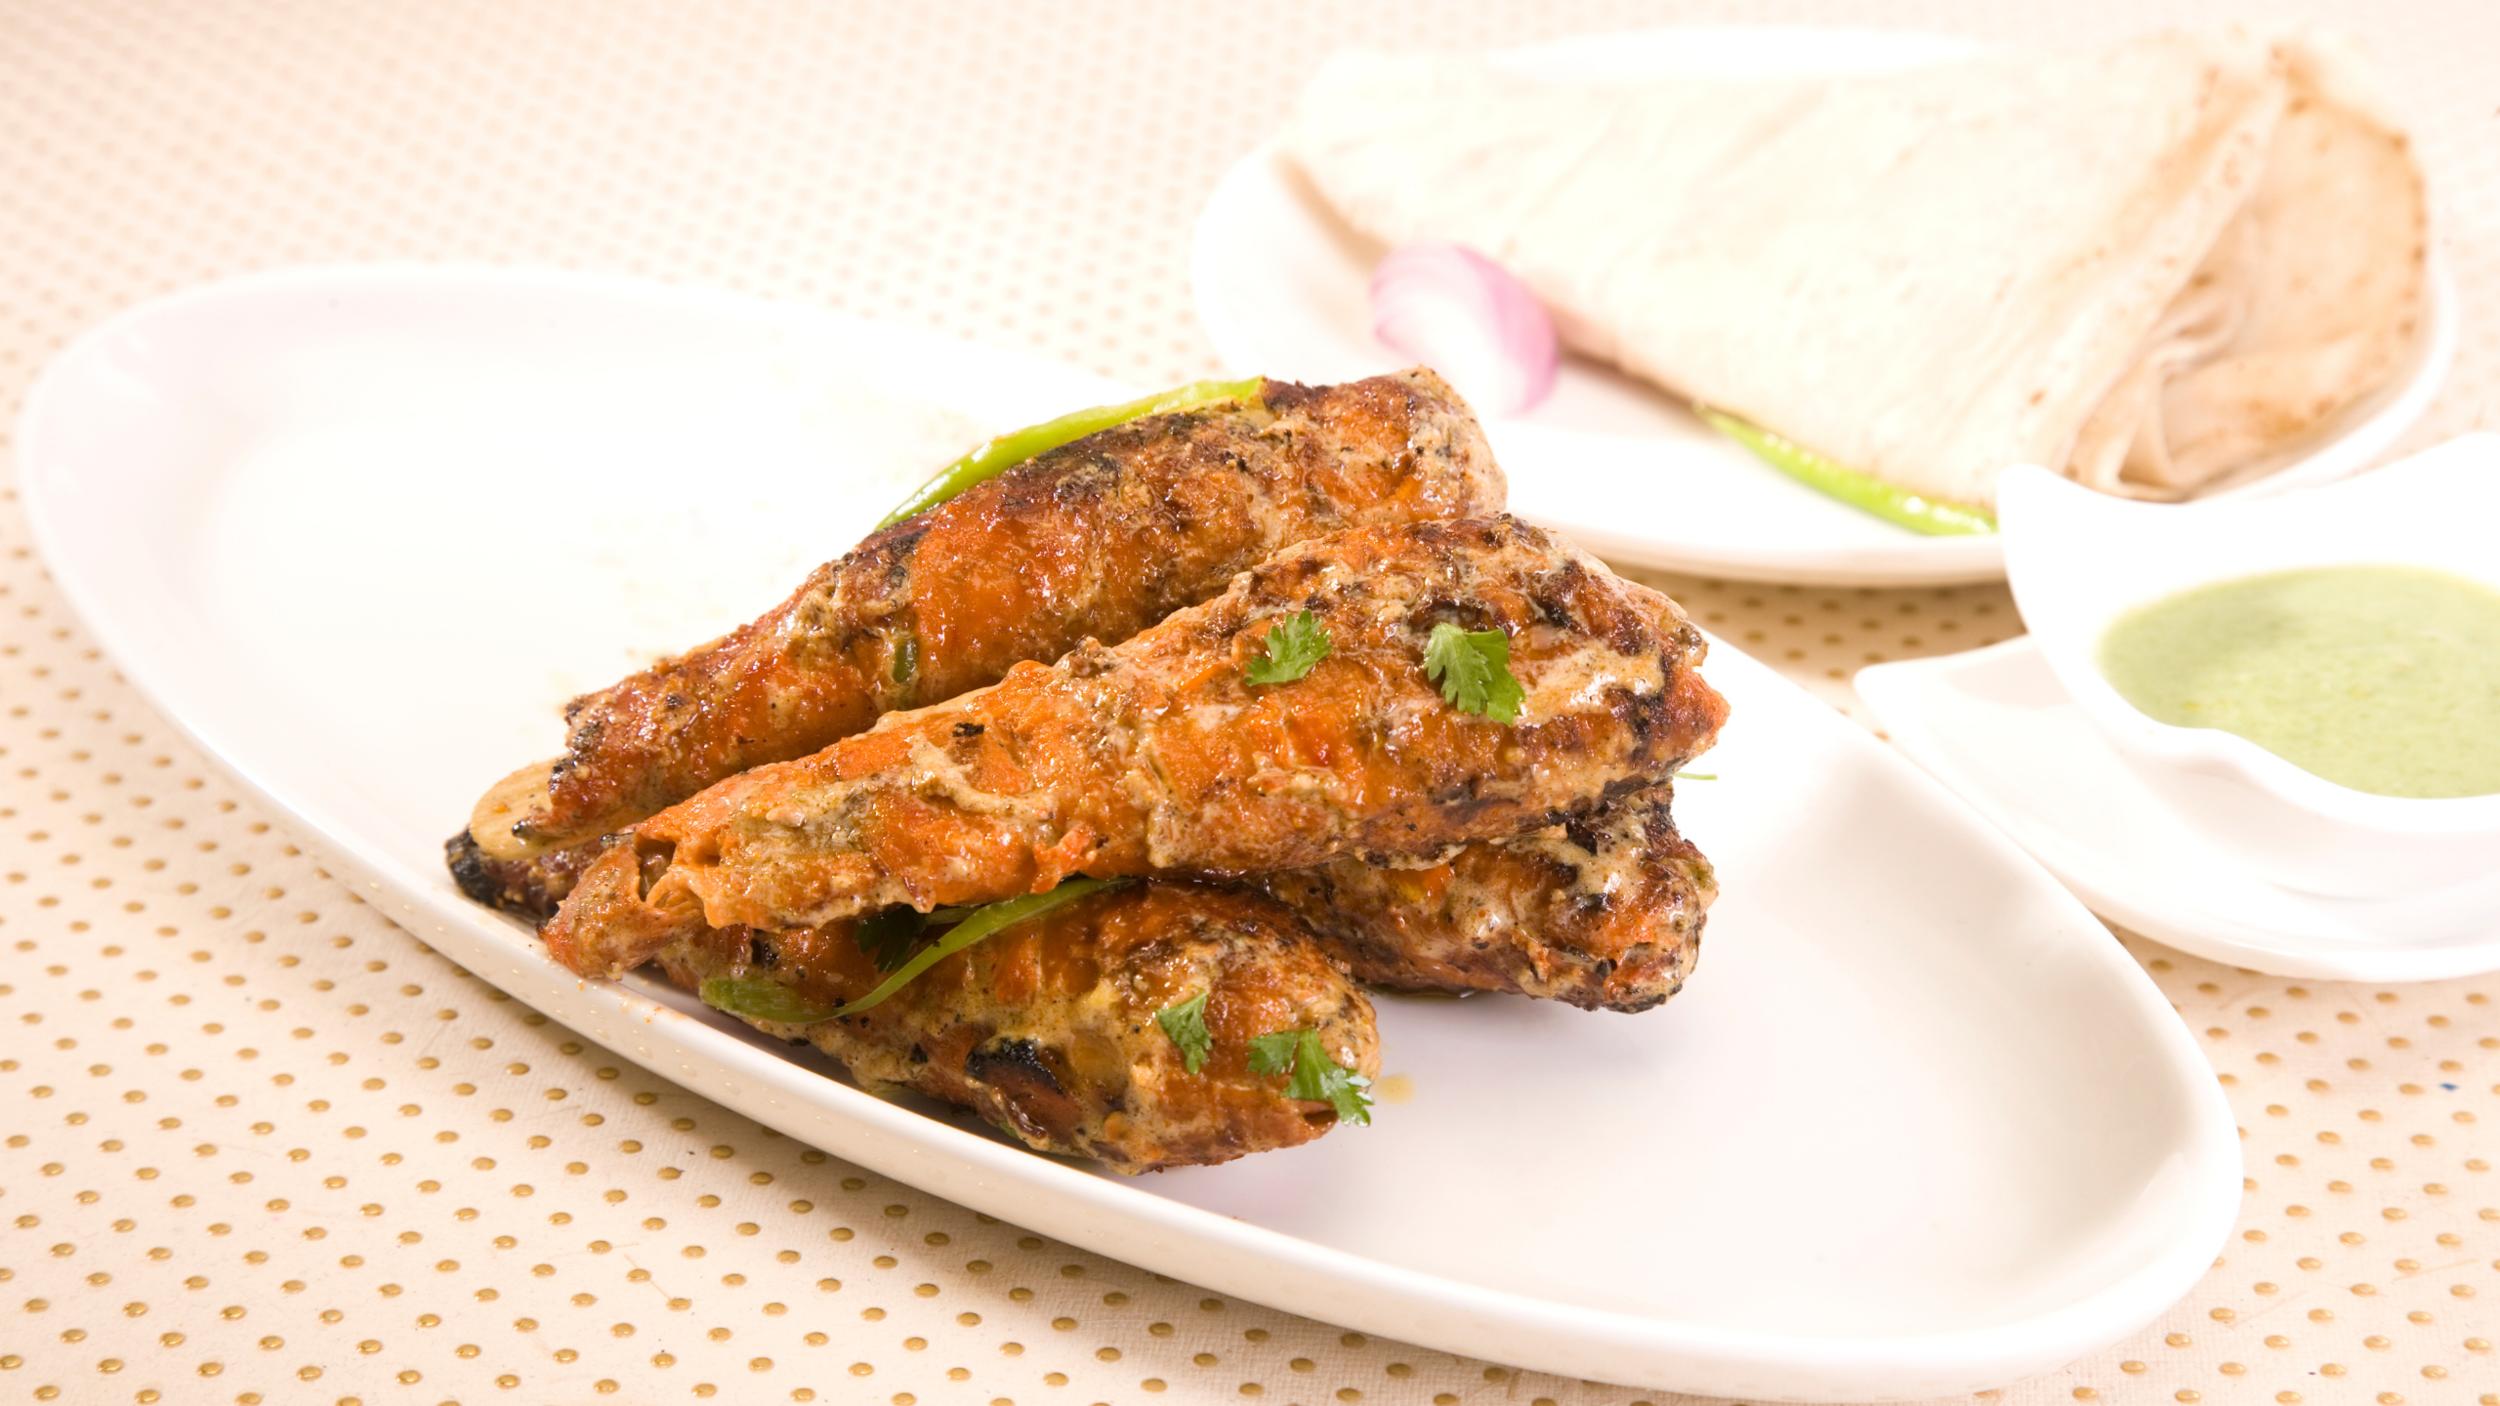 Soya Chaap is a typical vegetarian dish of New Delhi cuisine.